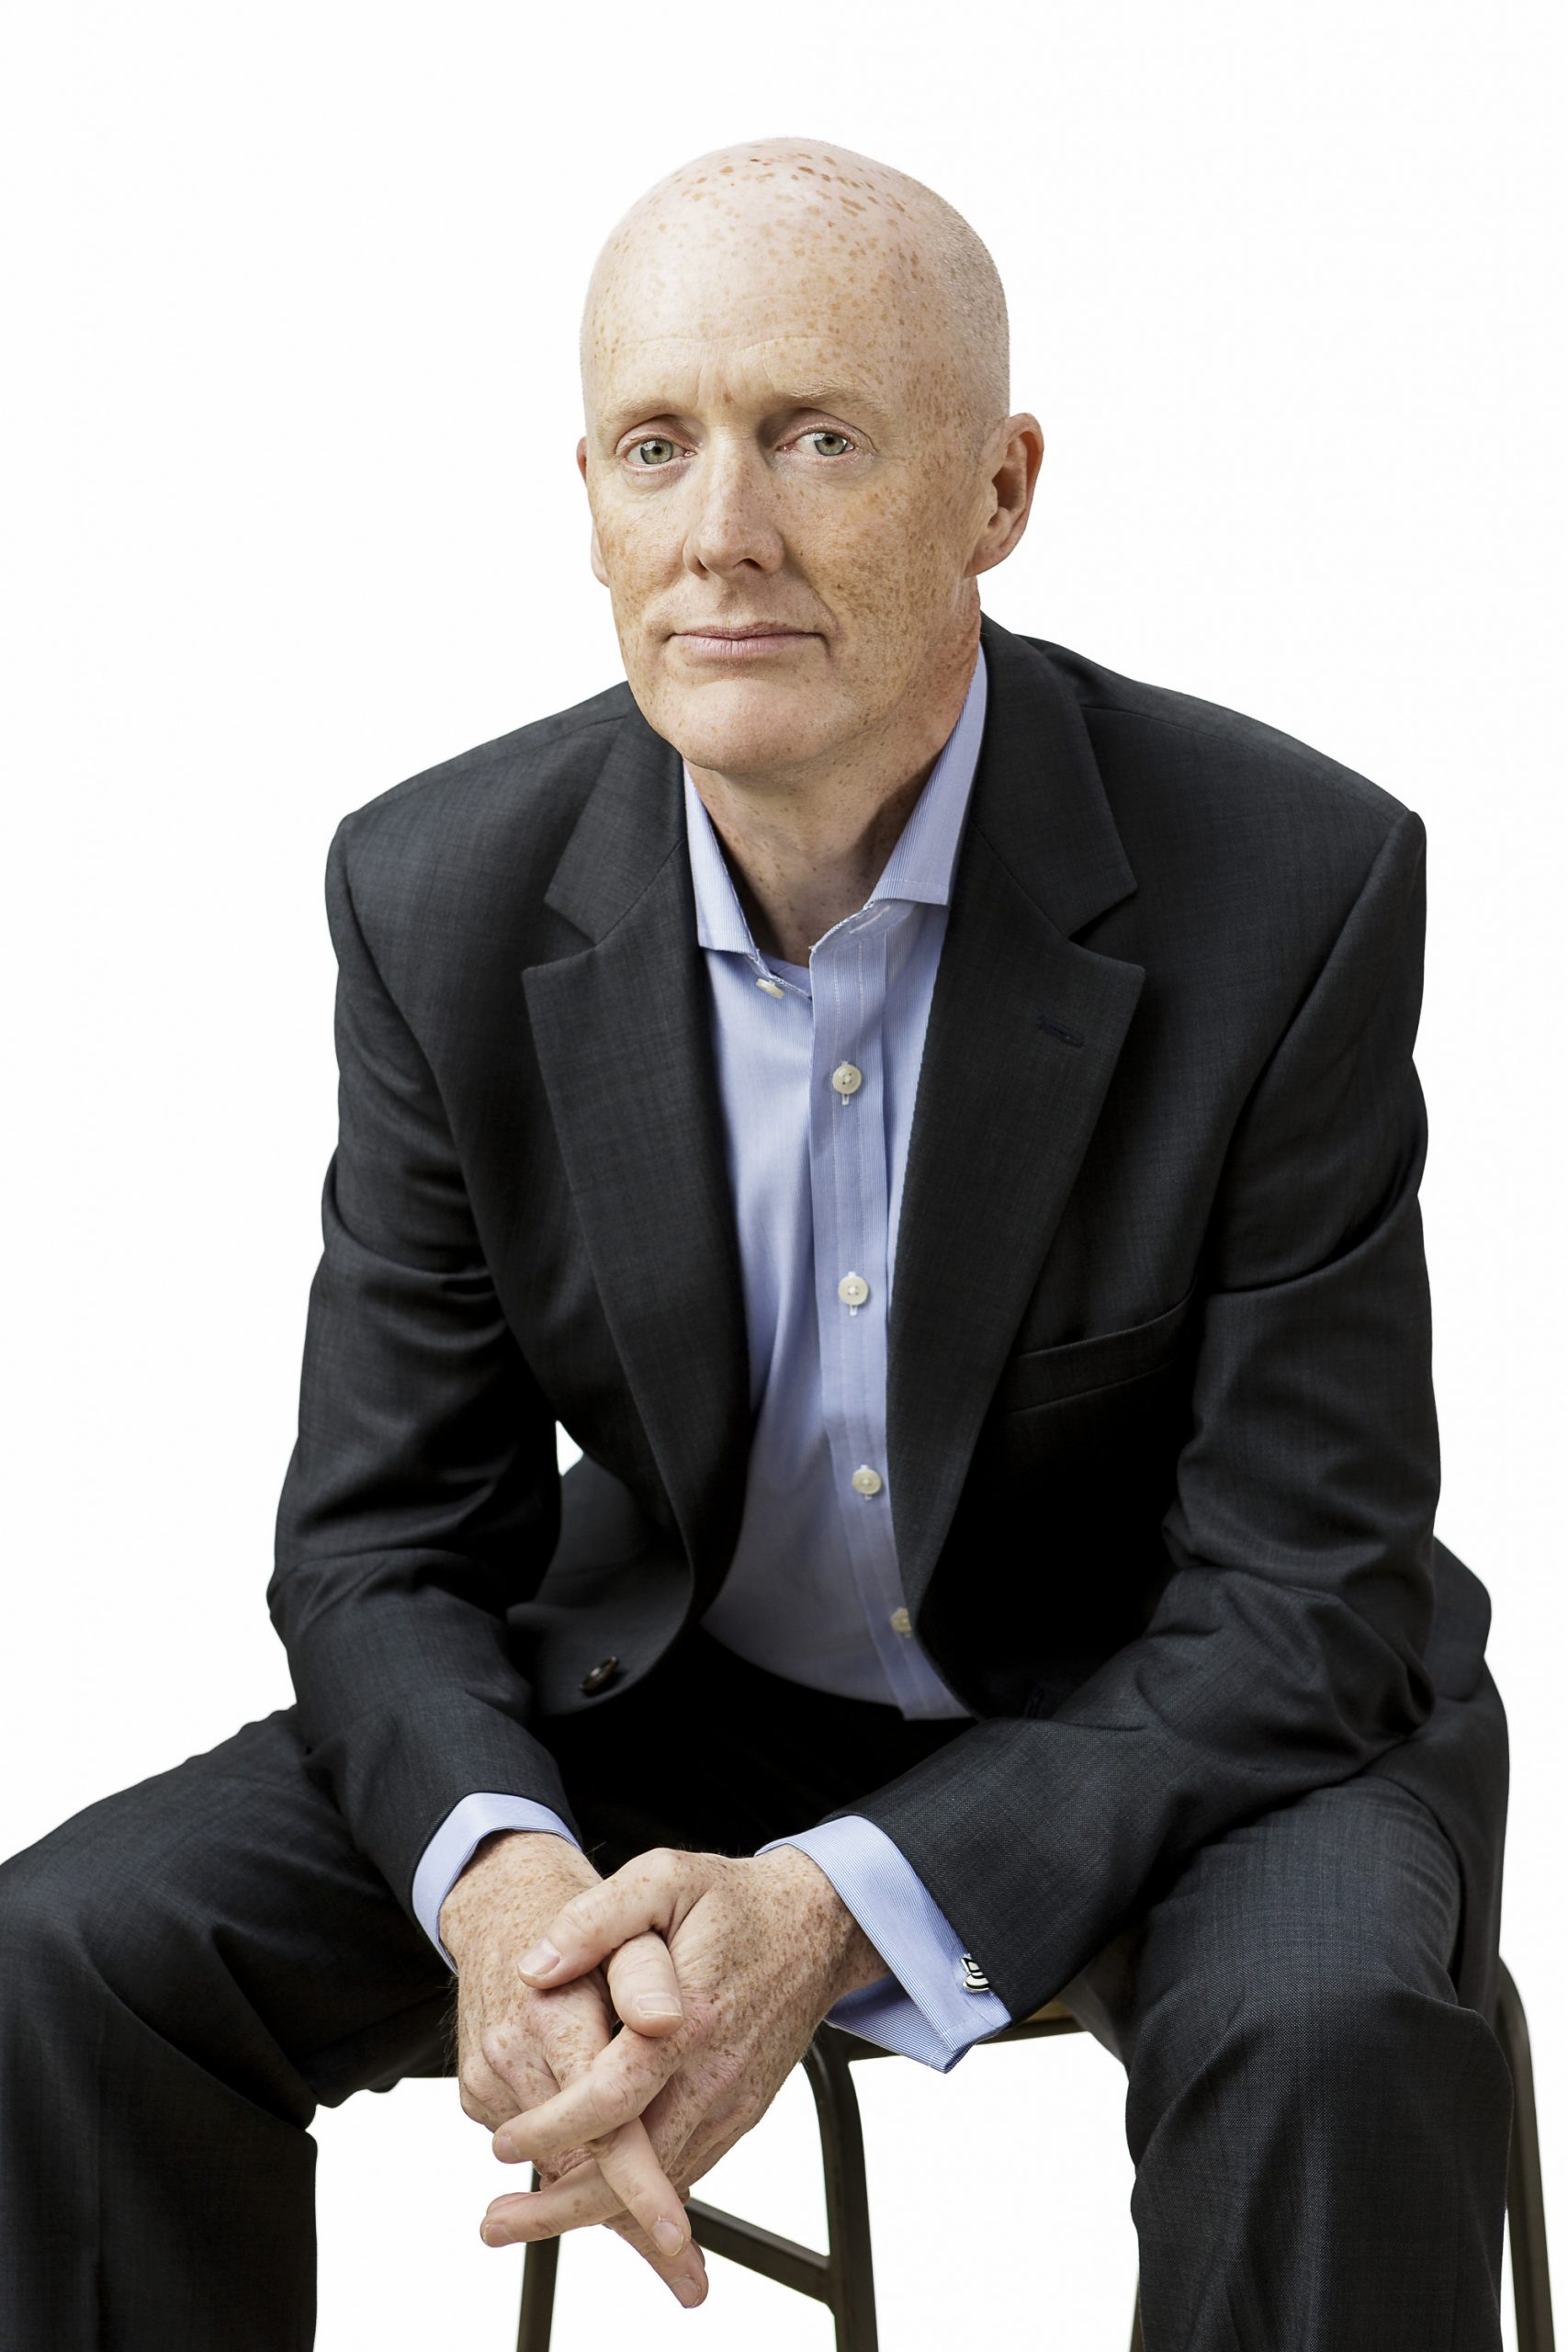 Andrew Rose